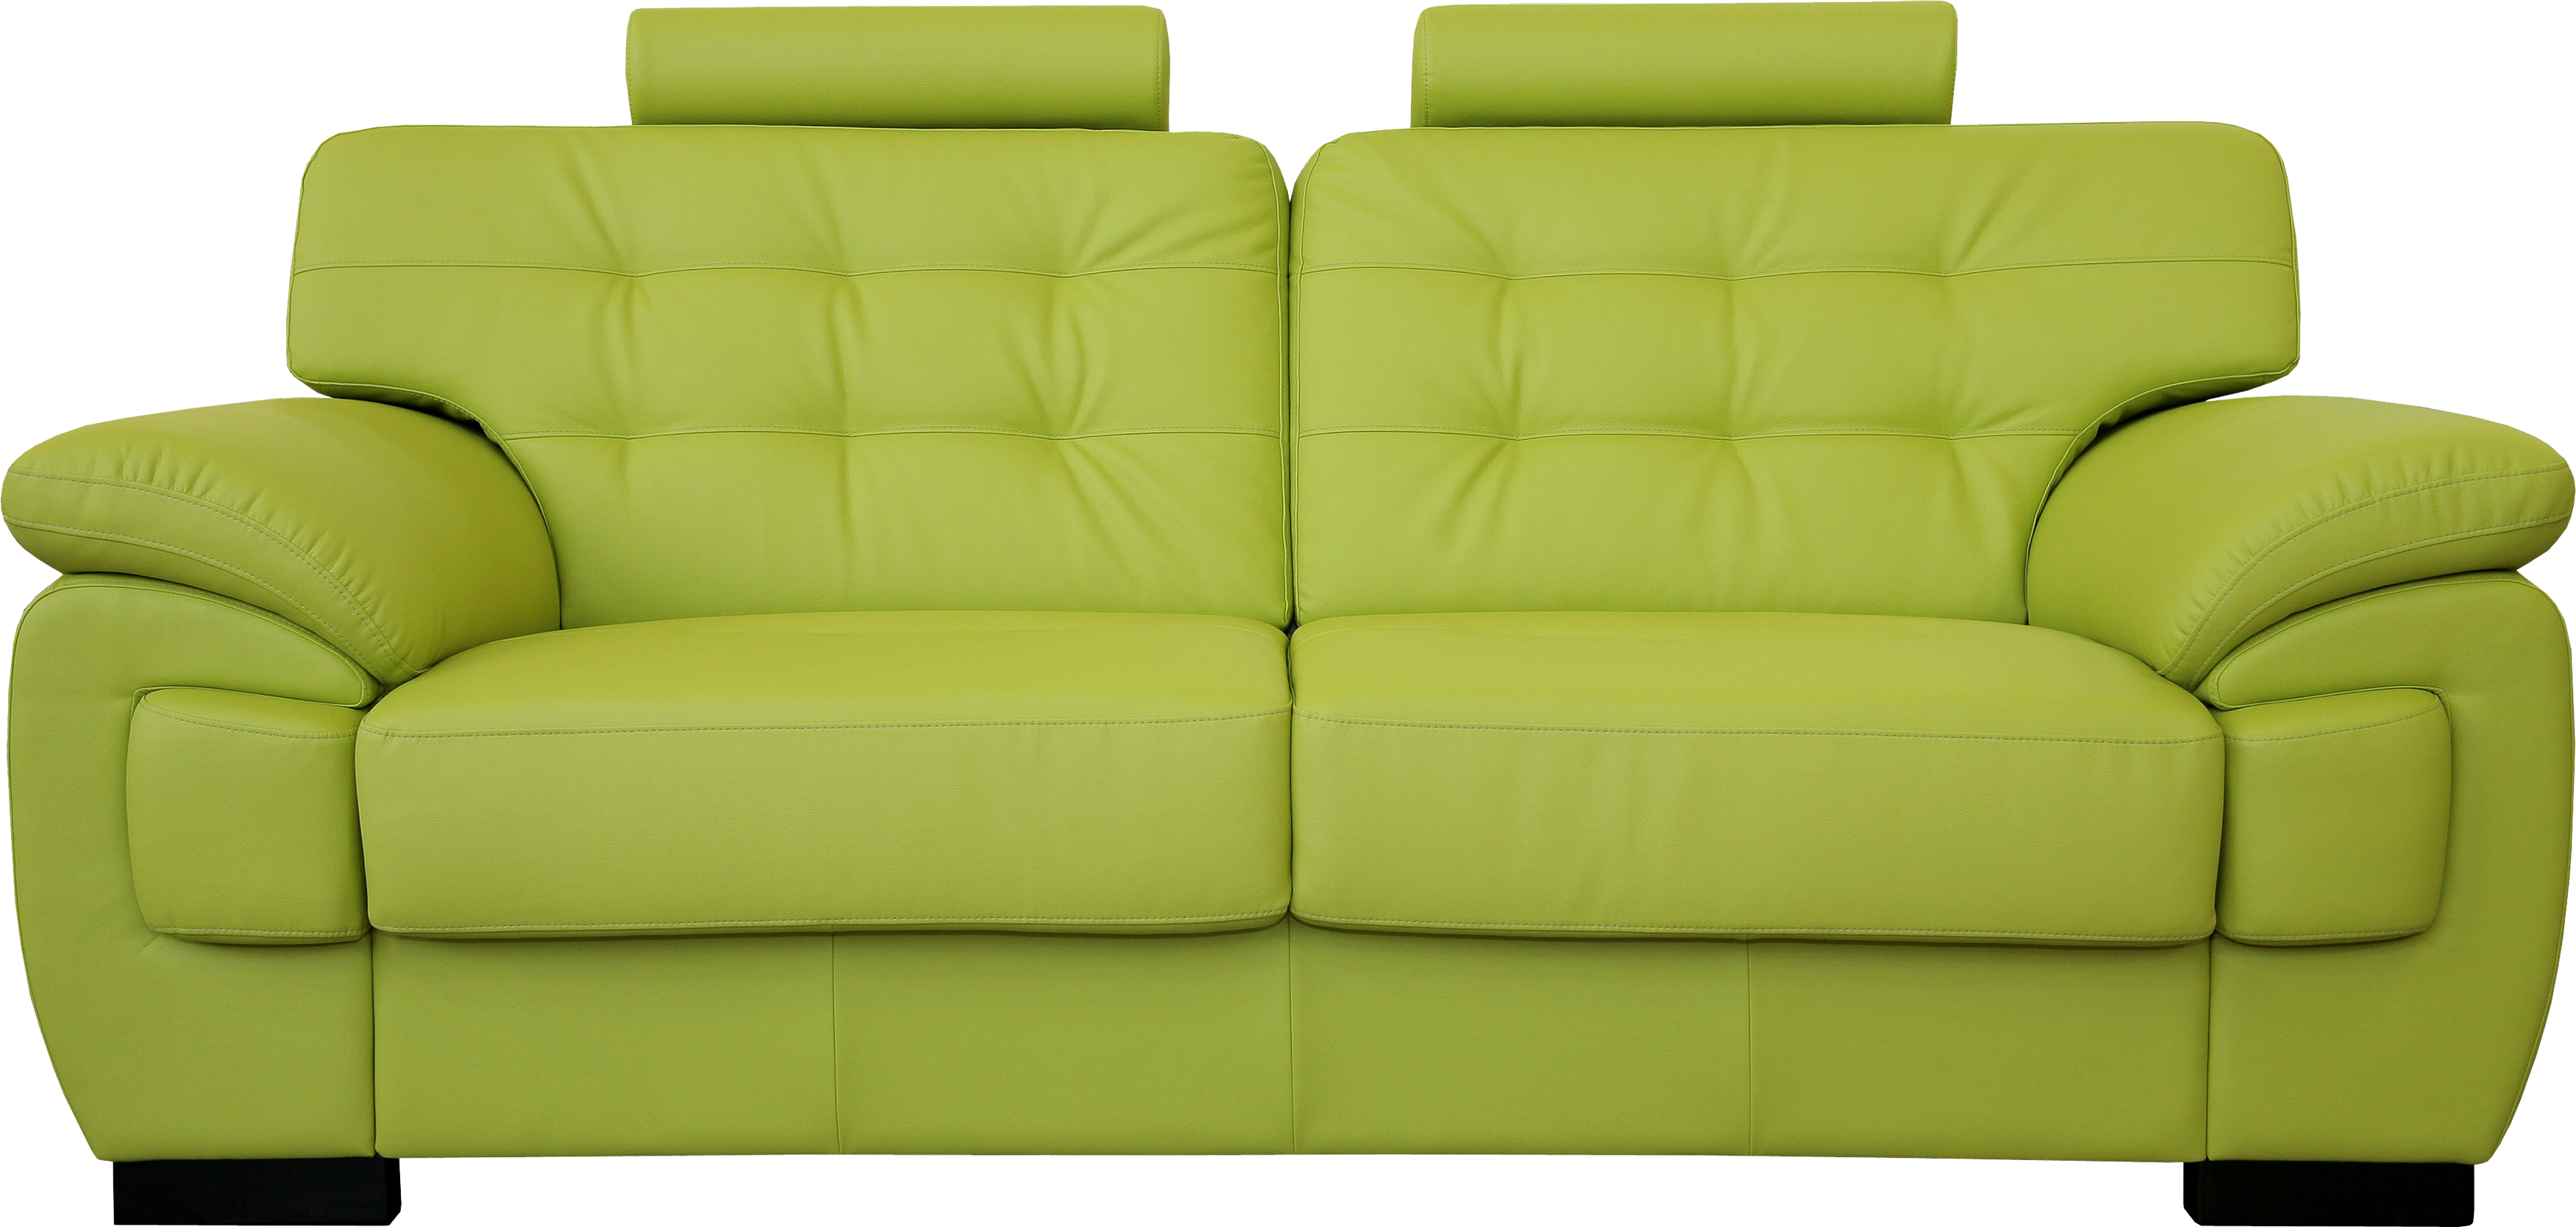 Sofa HD PNG - 118092